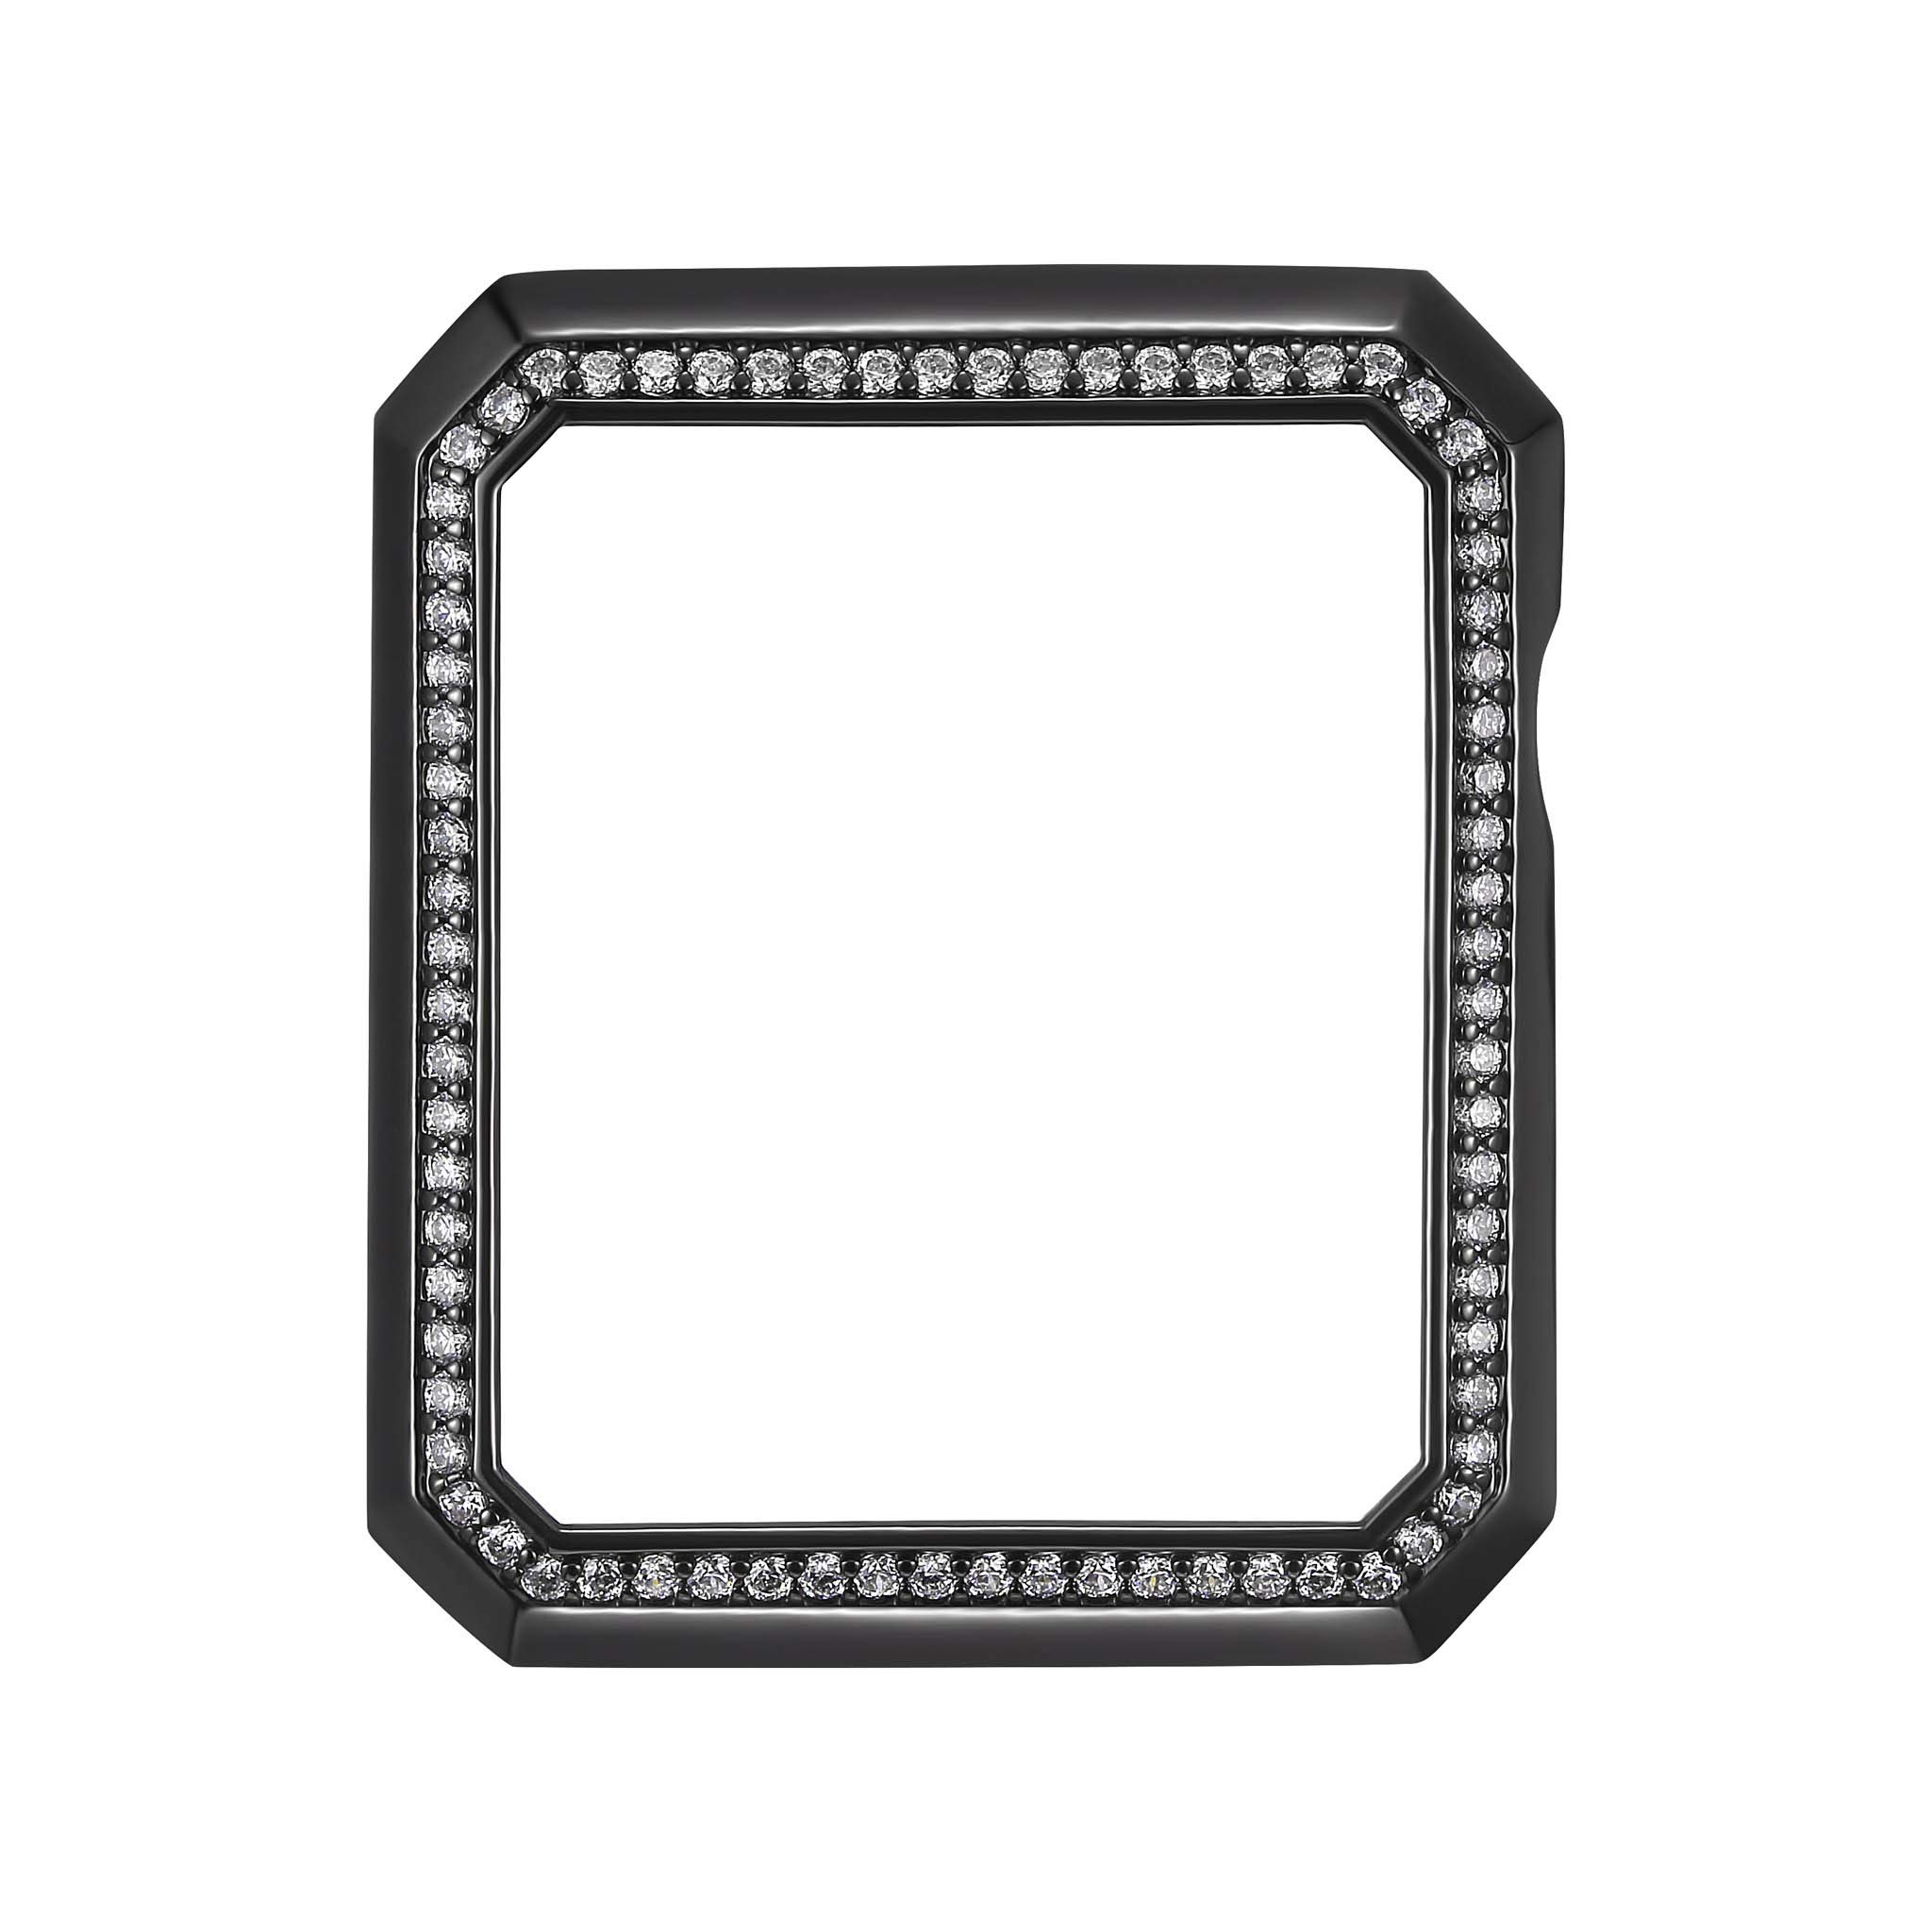 Black Rhodium Plated Bronze Deco Halo Jewelry-Style Apple Watch Case with Swarovski Zirconia CZ Border - Small (Fits 38mm iWatch)